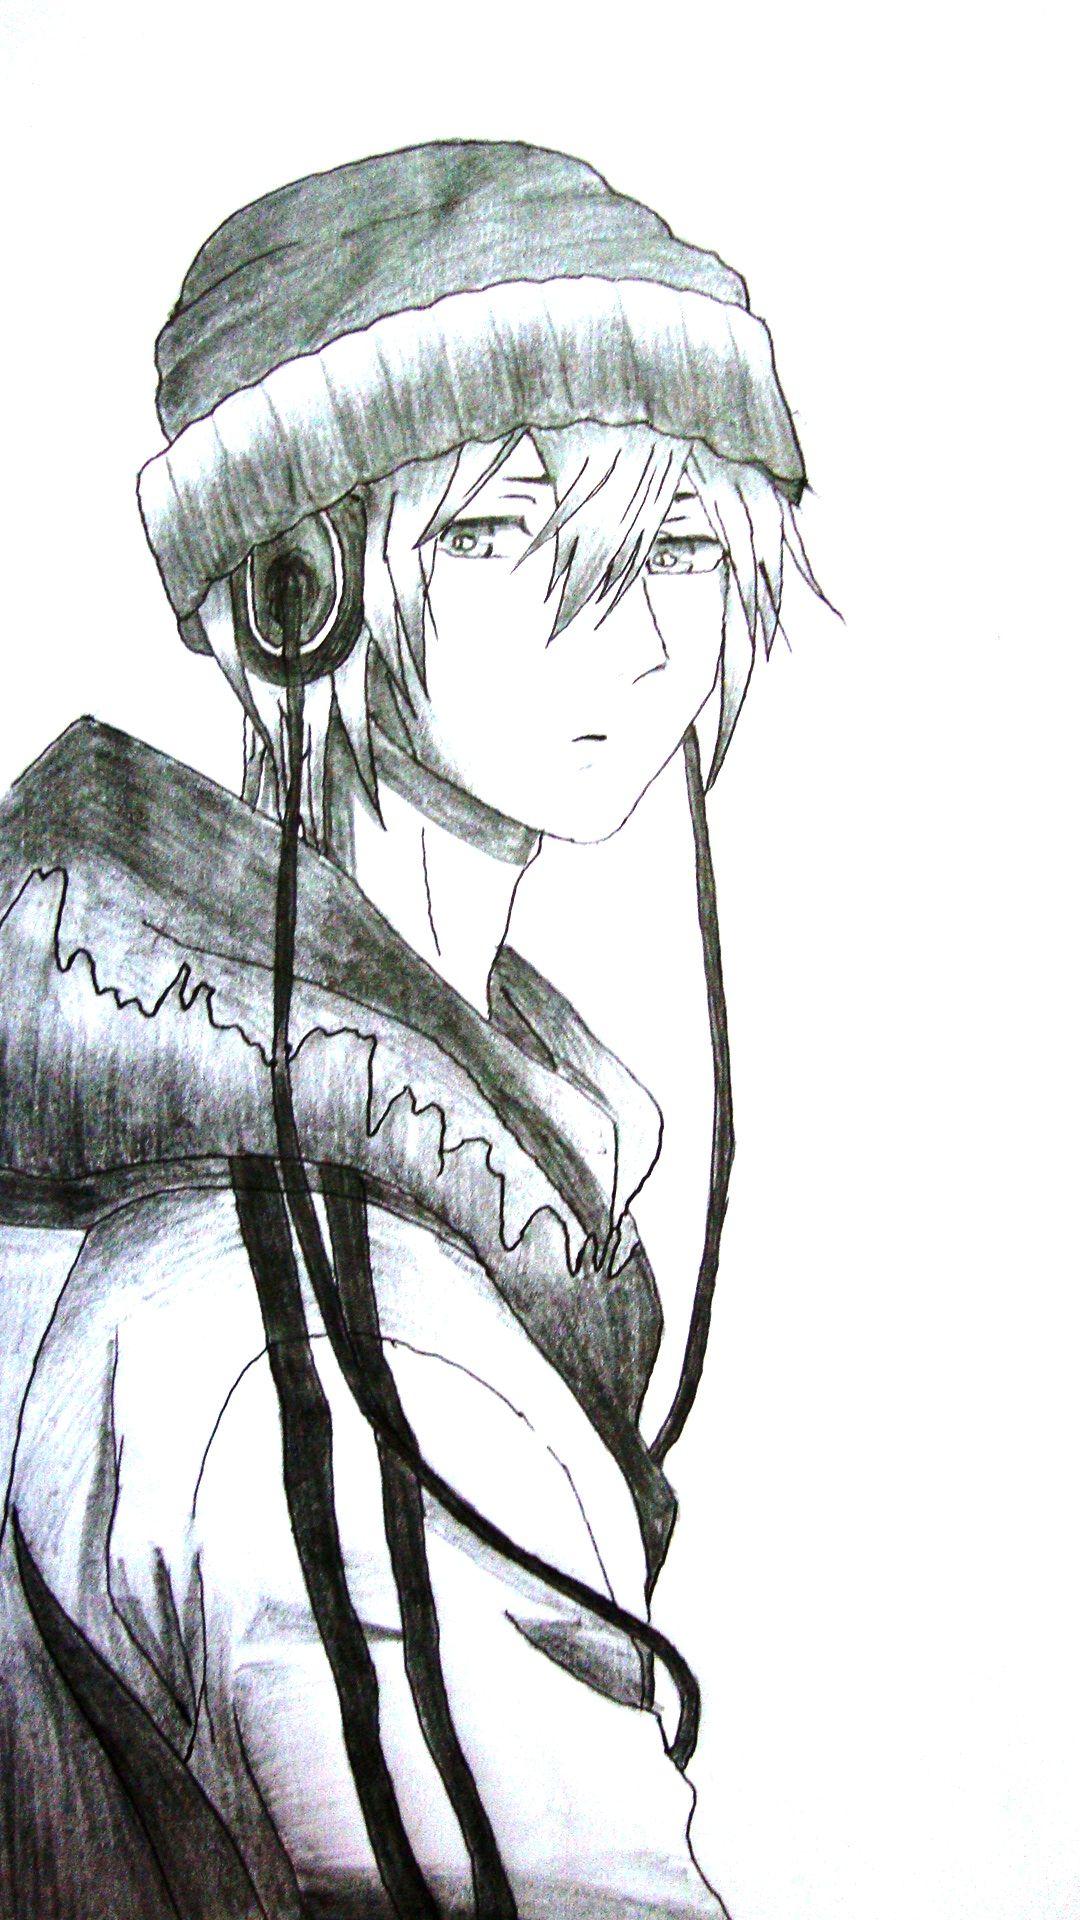 Anime Headphones Boy Pencil Sketch Anime Art Anime Anime Art Beautiful